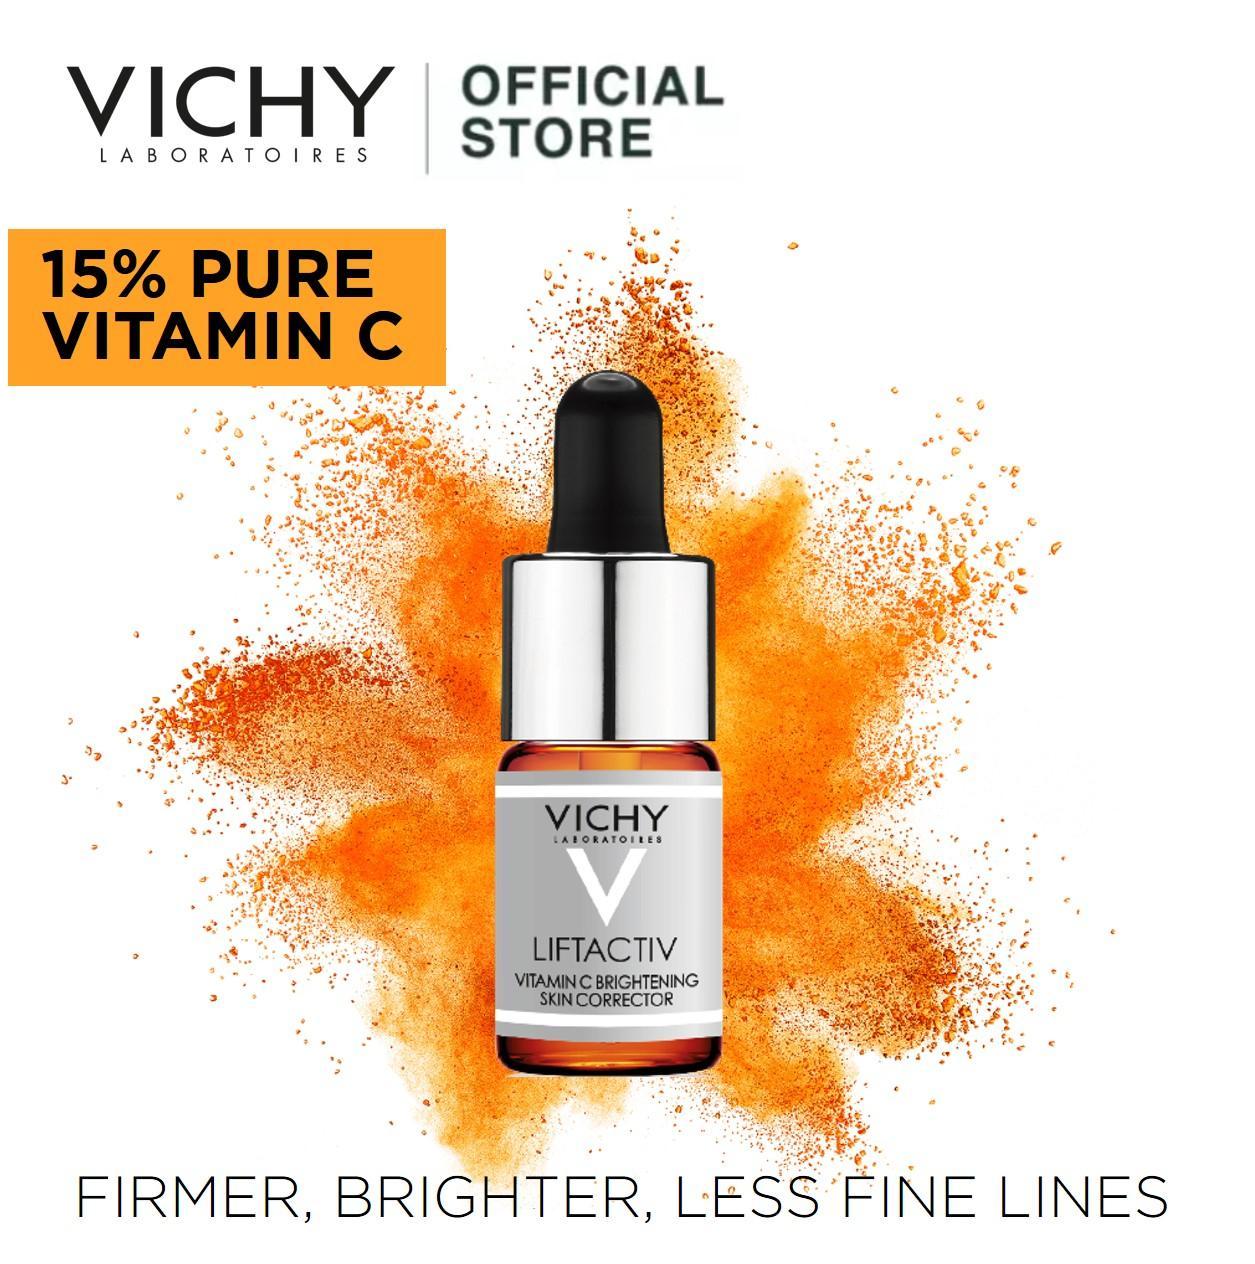 Compare Vichy Liftactiv Vitamin C Brightening Skin Corrector 10Ml